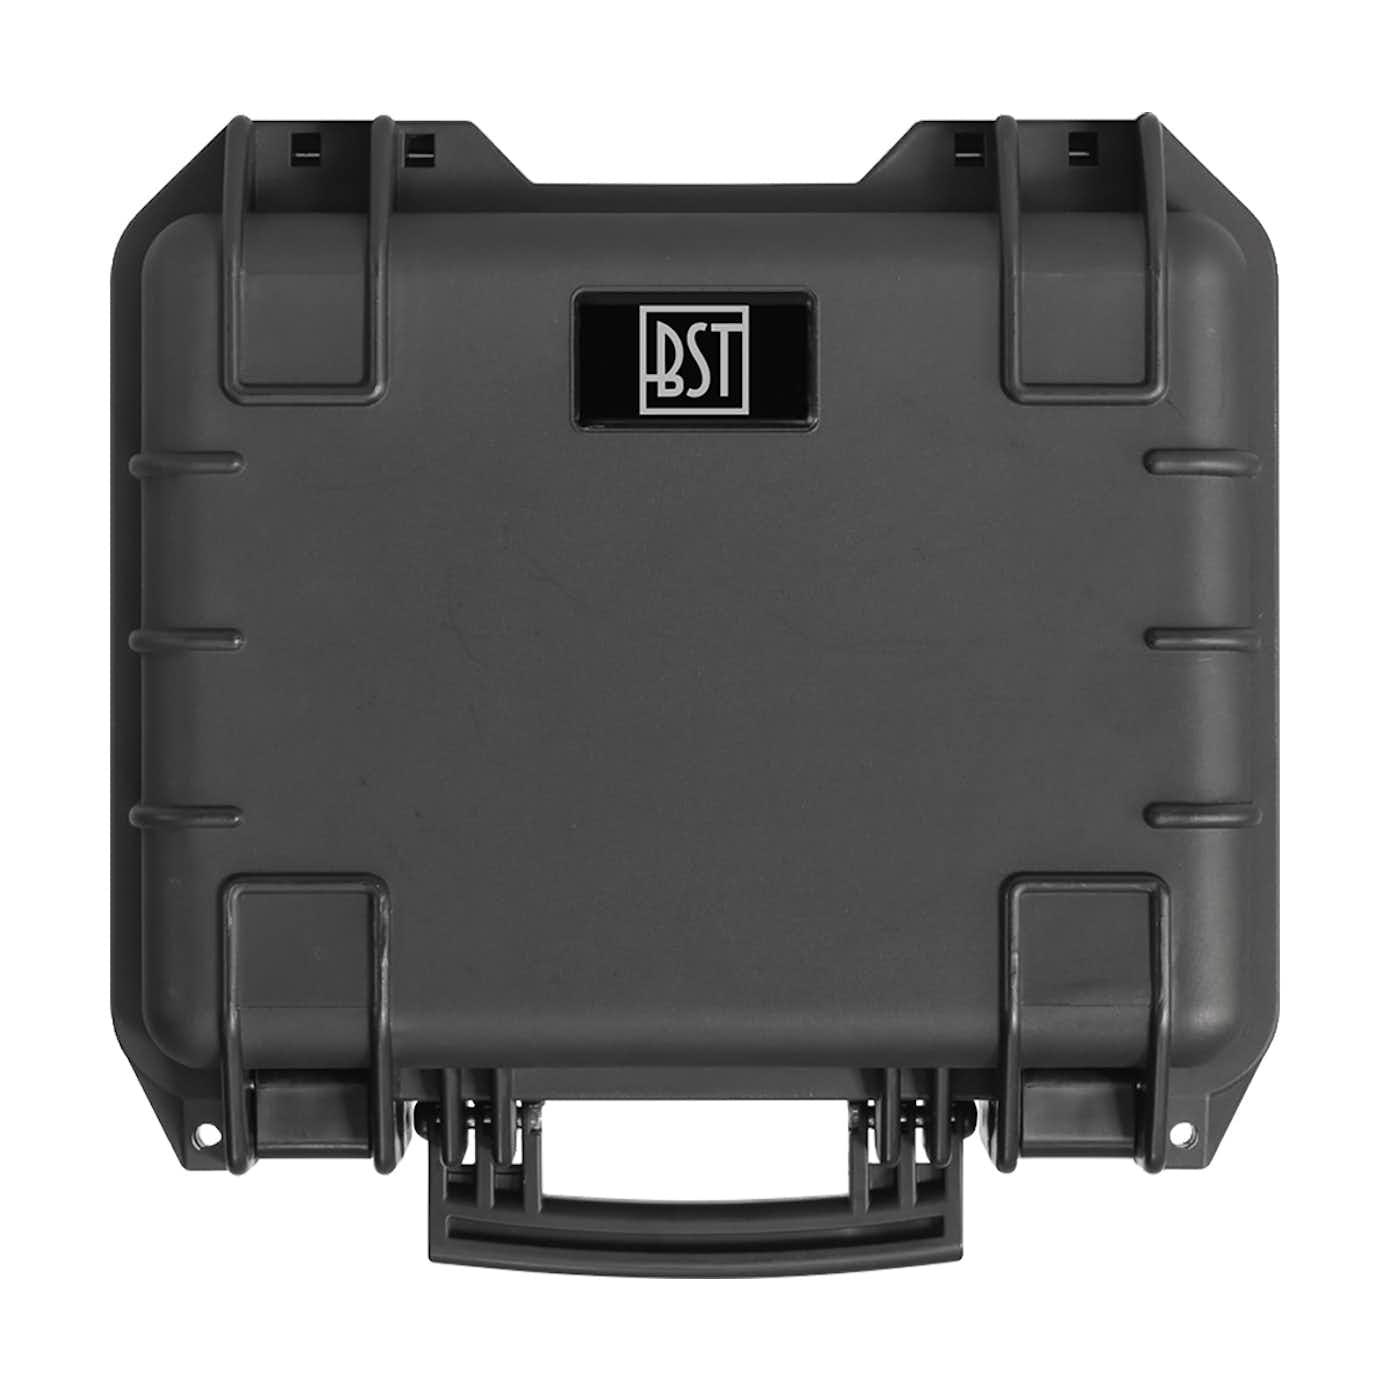 BST PFC-02 transport case